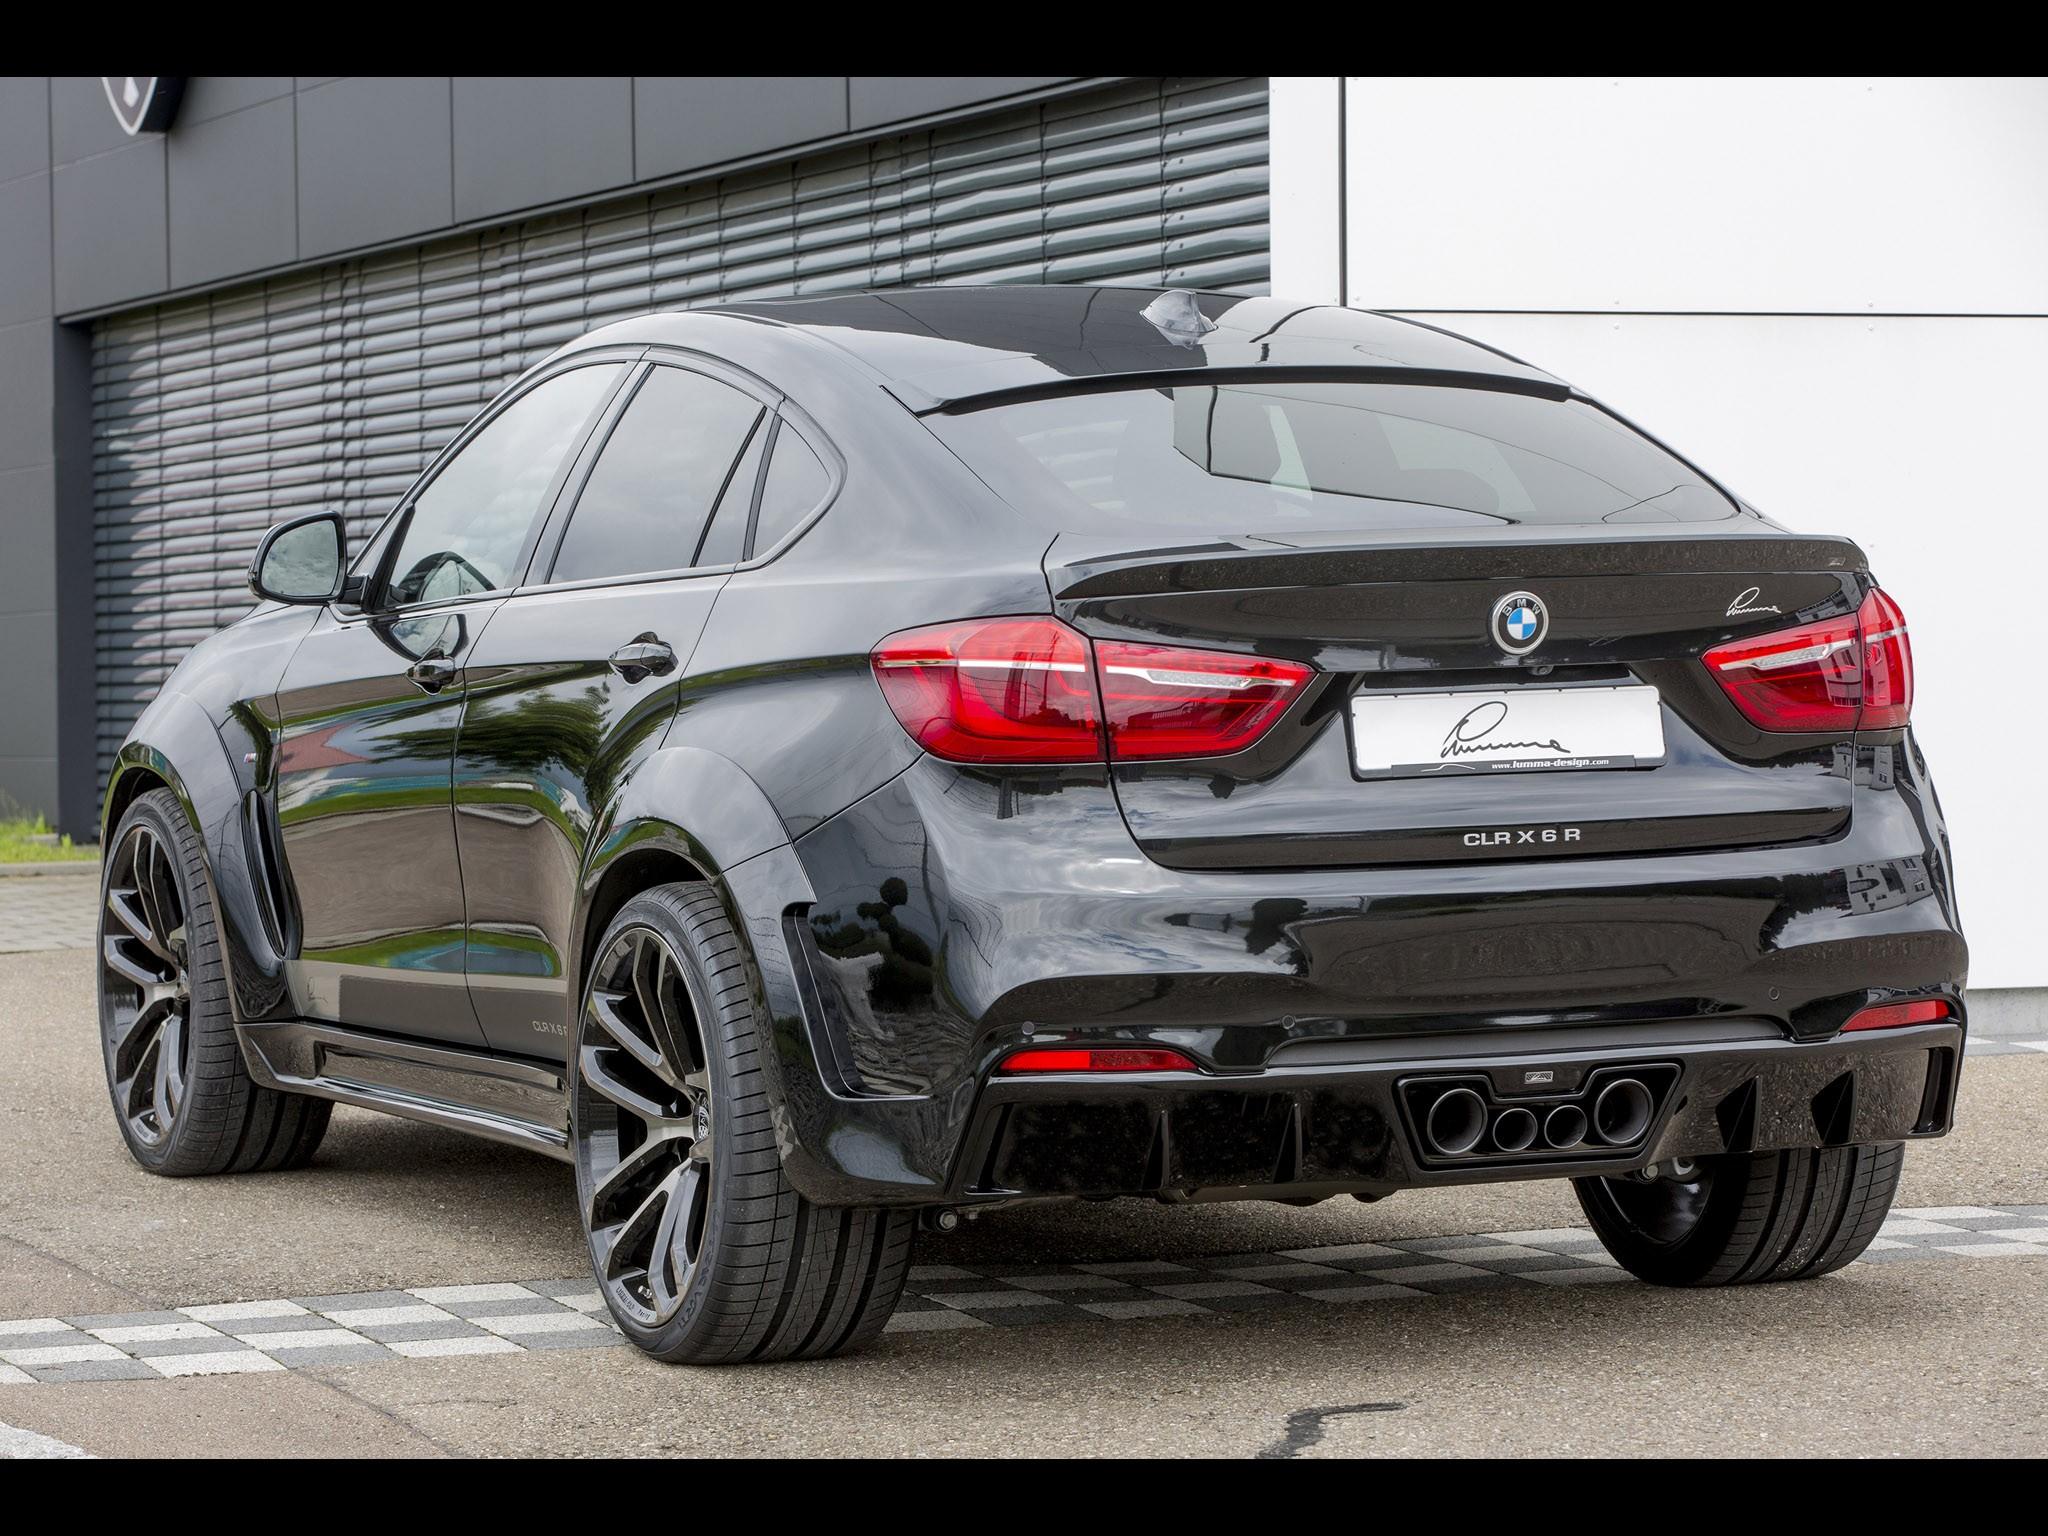 2015 Lumma Design - Bmw X6 CLR X6R F16